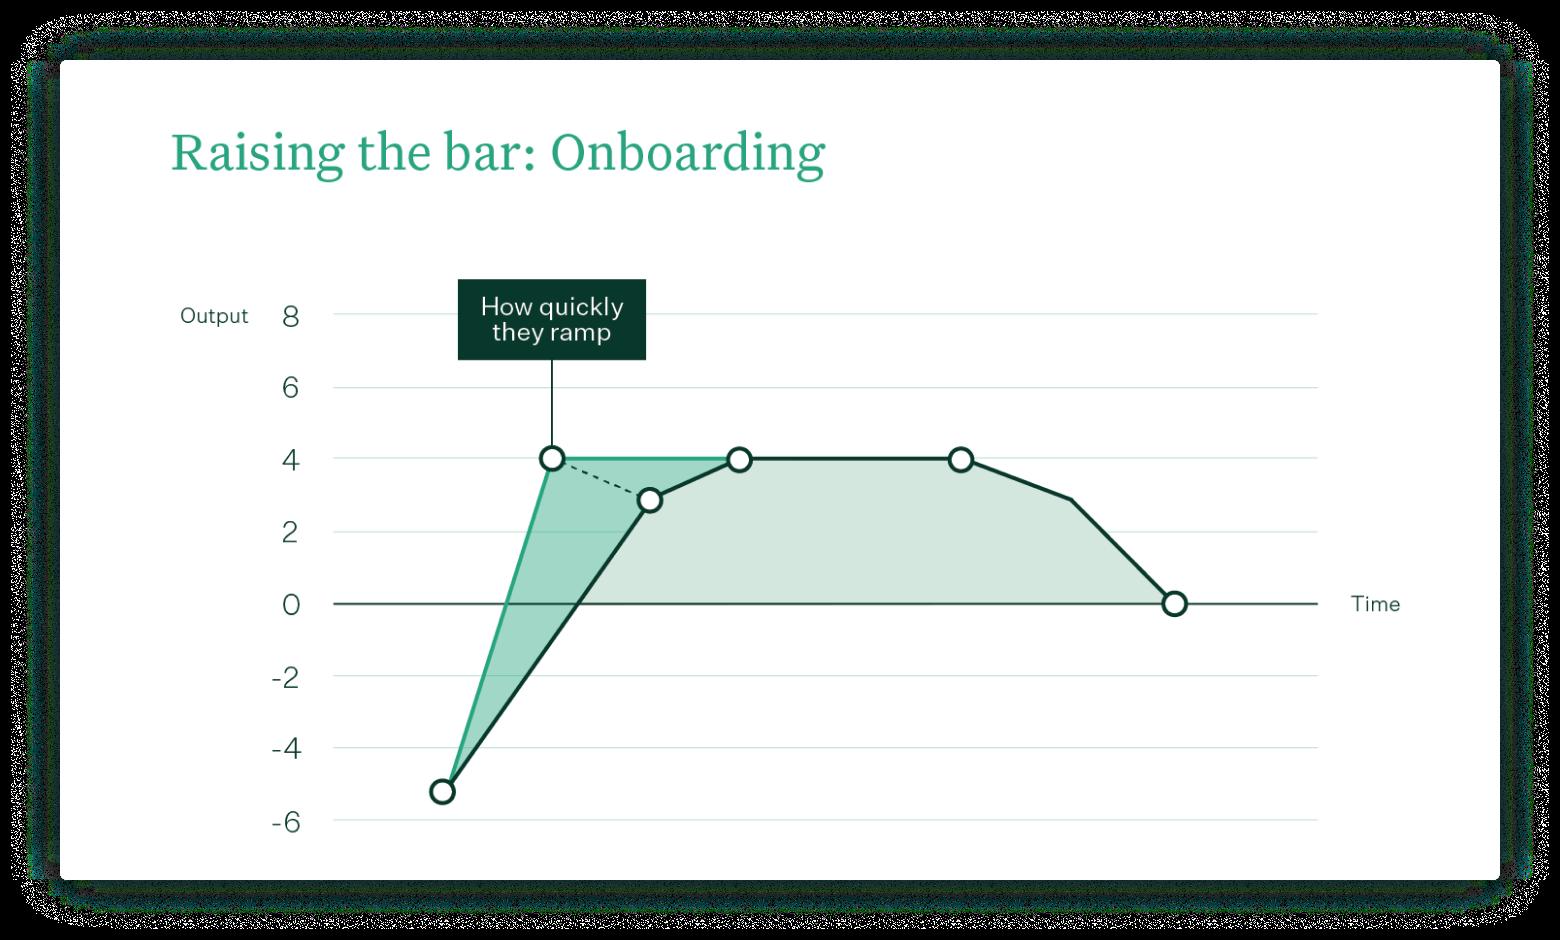 ELTV - Raising the bar - Onboarding